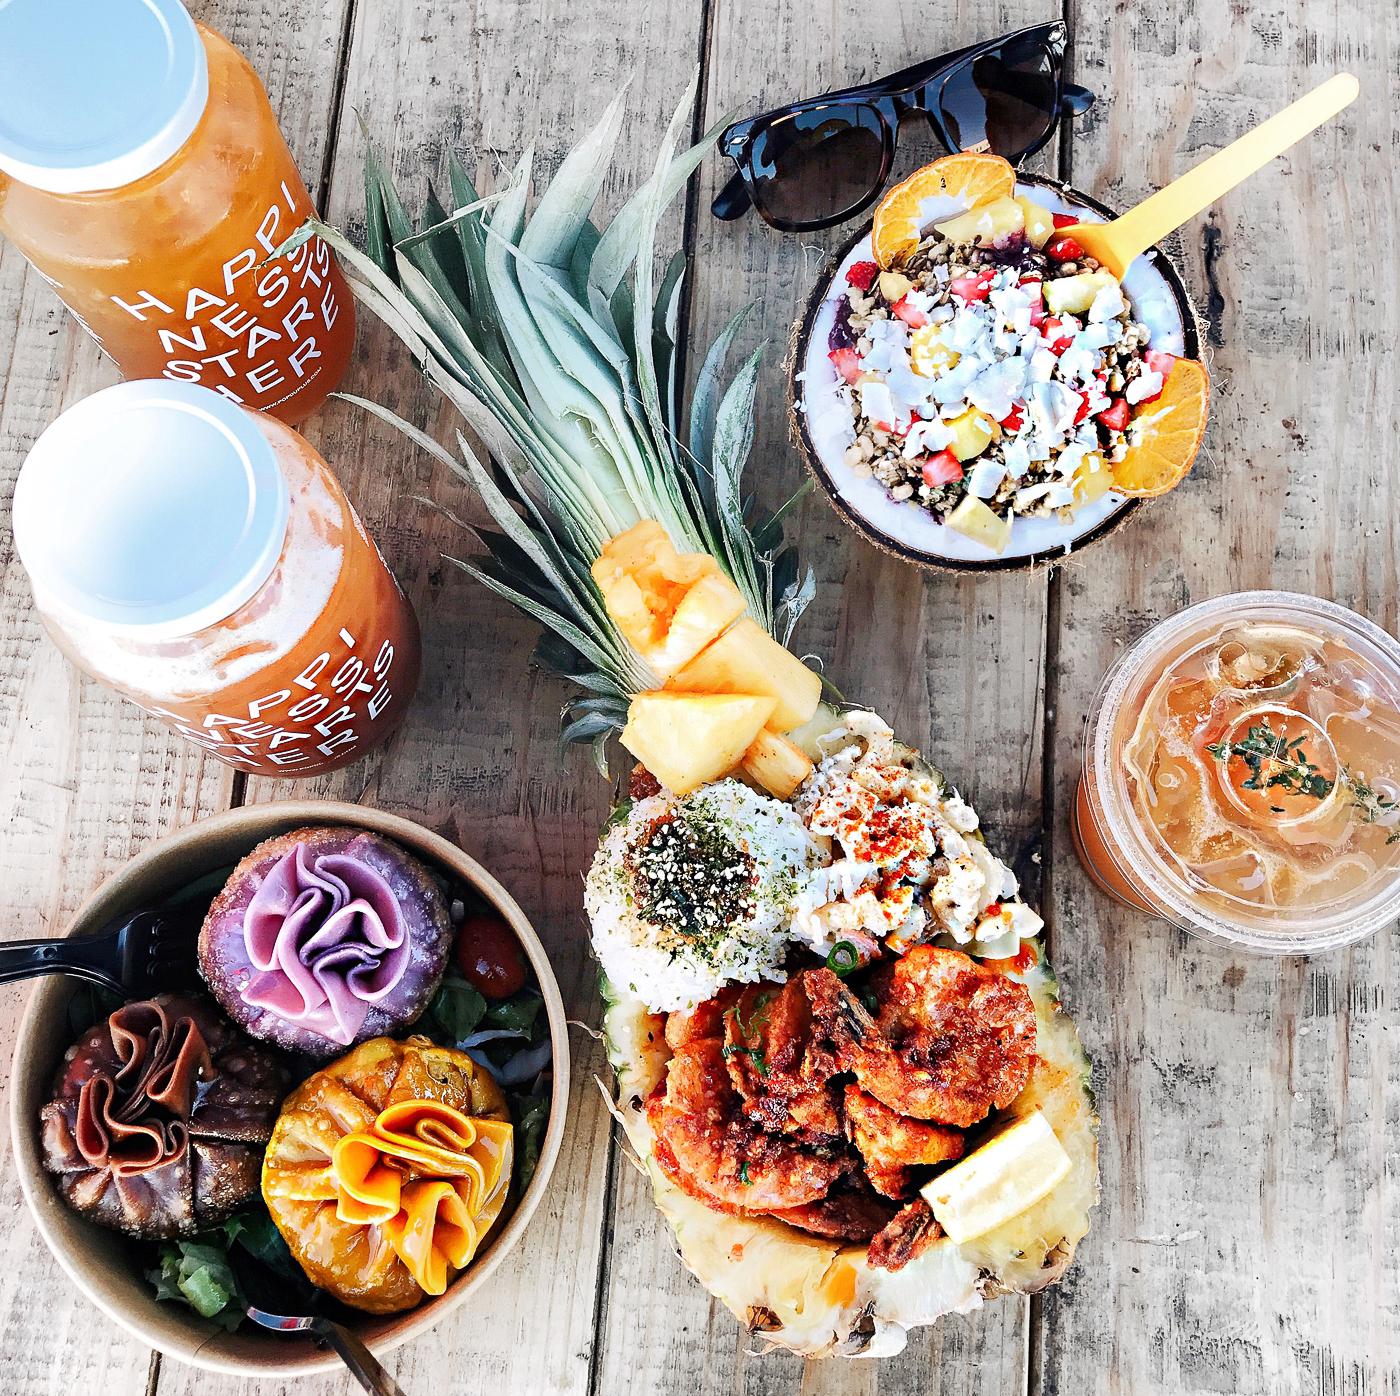 Smorgasburg - LA Food Guide | The Chic Diary